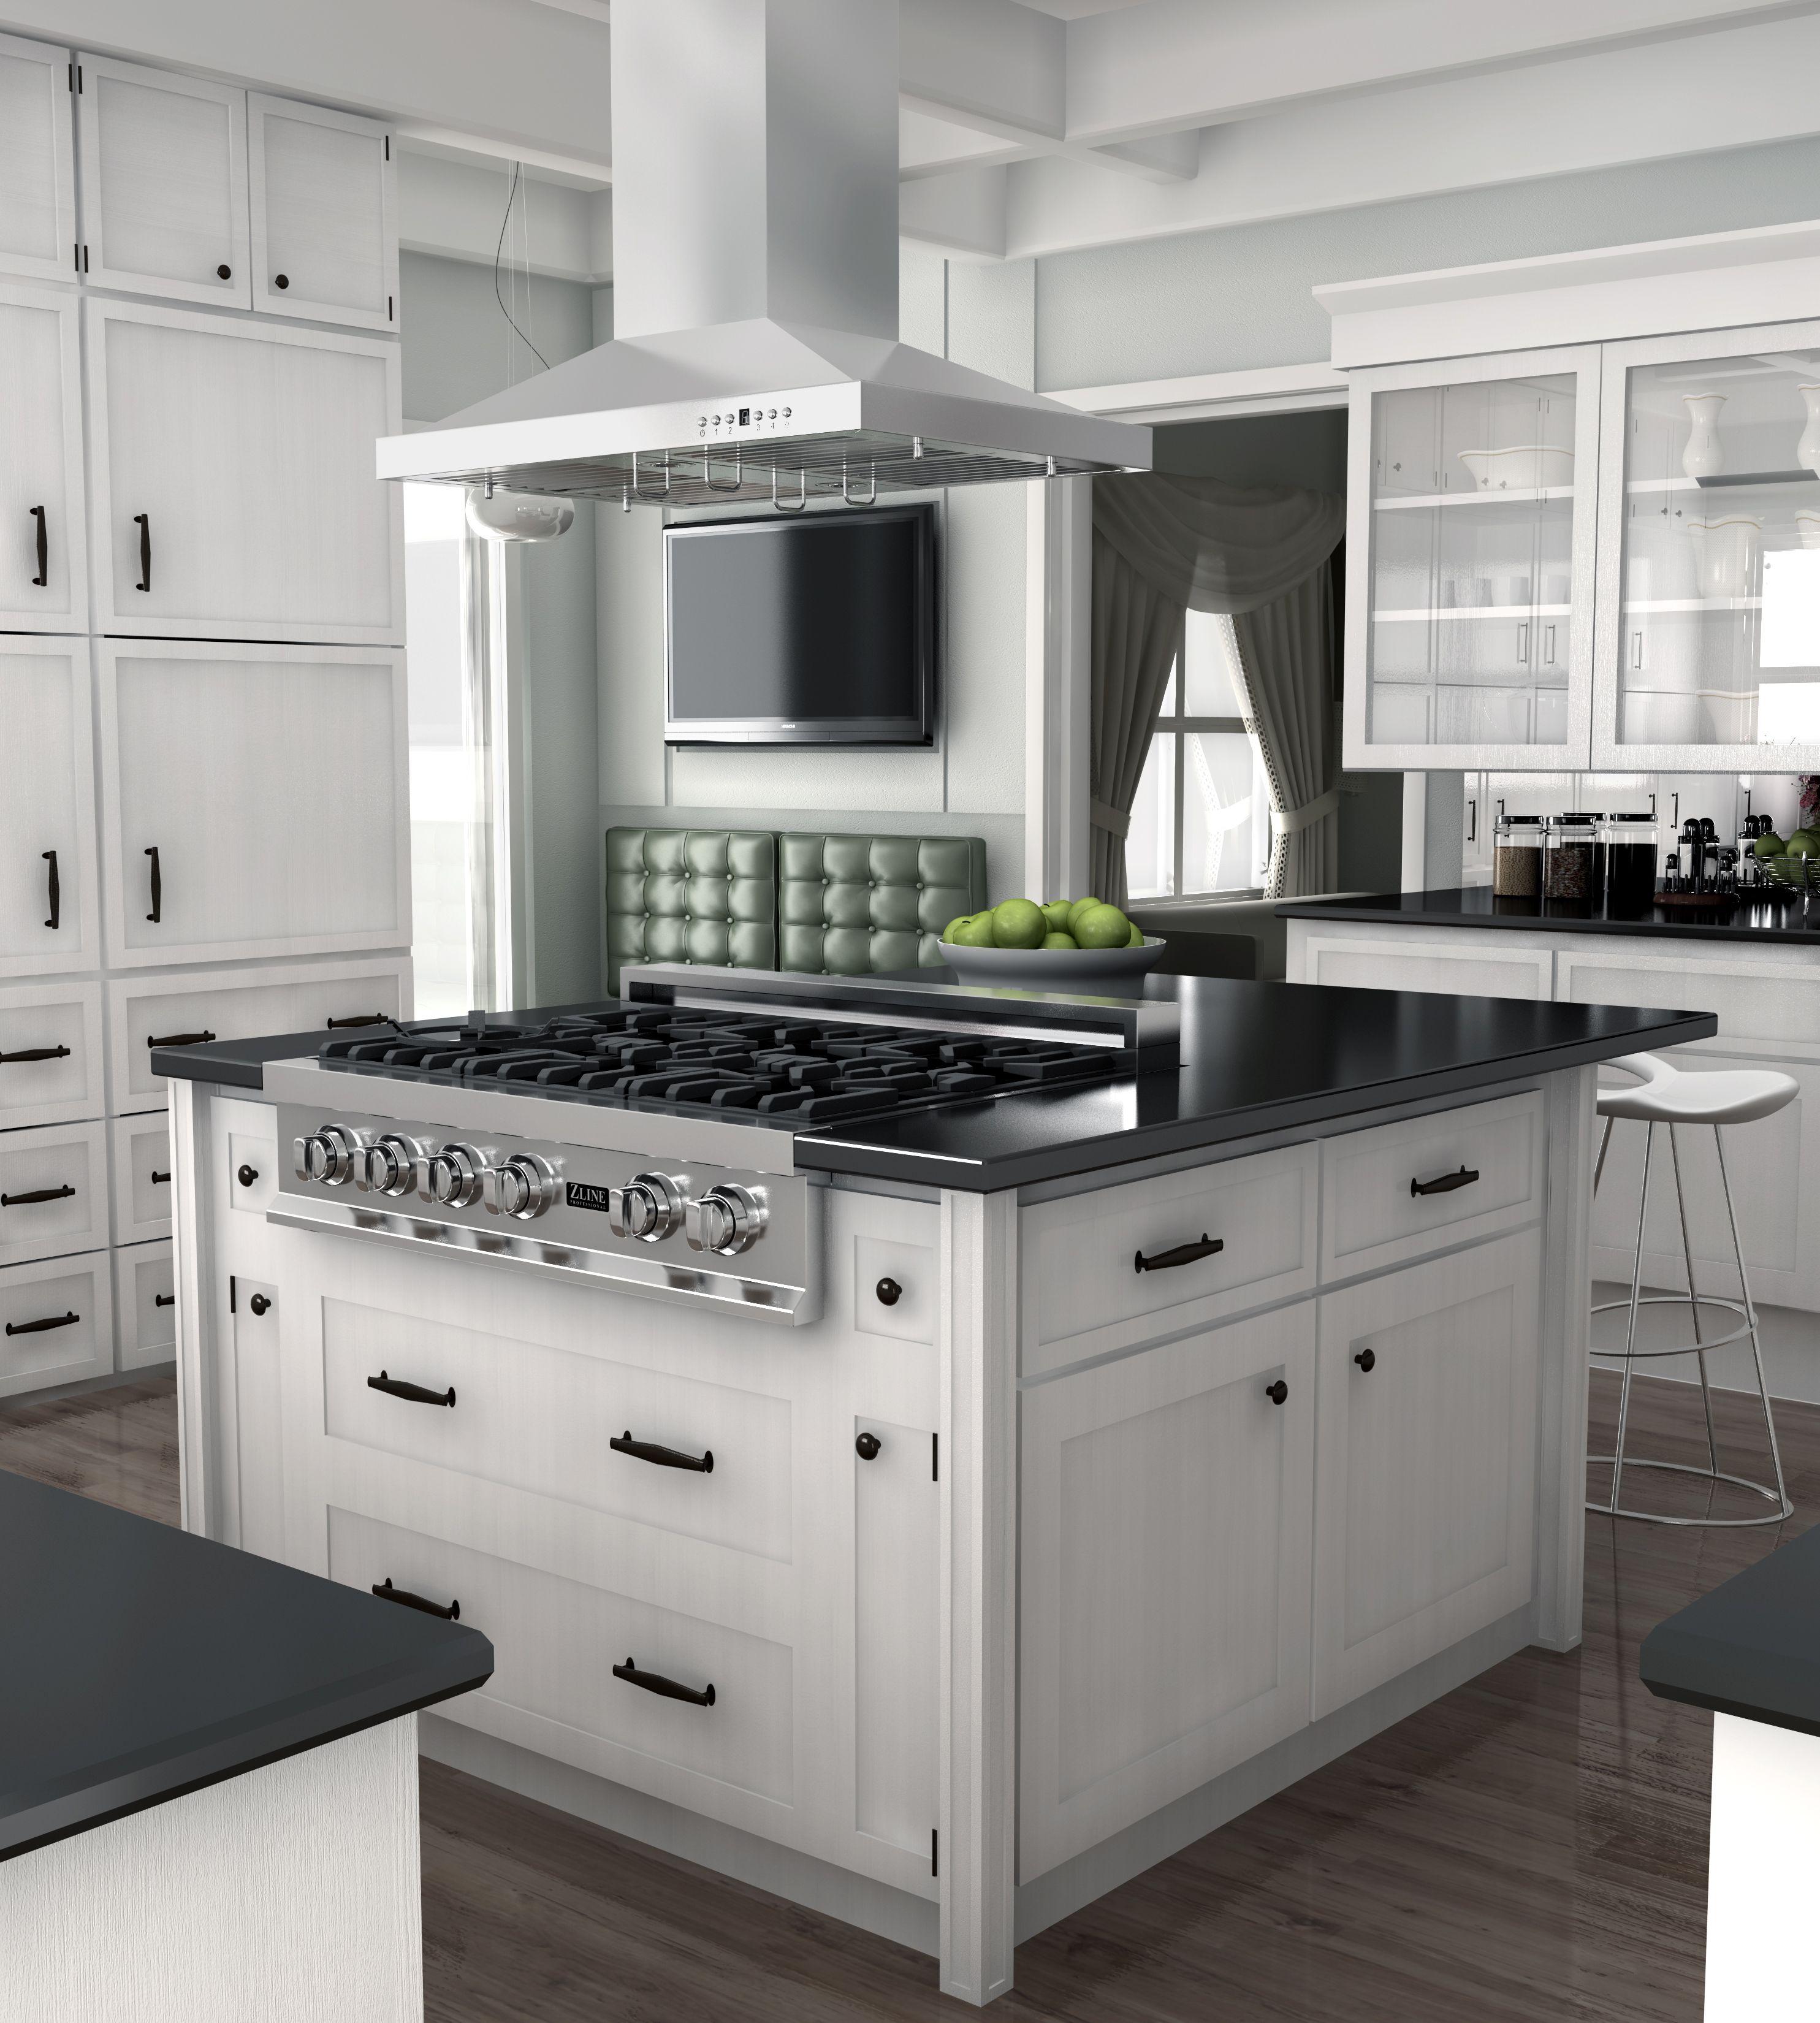 Zline 48 Island Range Hood With 2 Lights Gl2i 48 2 Kitchen Island With Cooktop Kitchen Island With Stove Kitchen Design